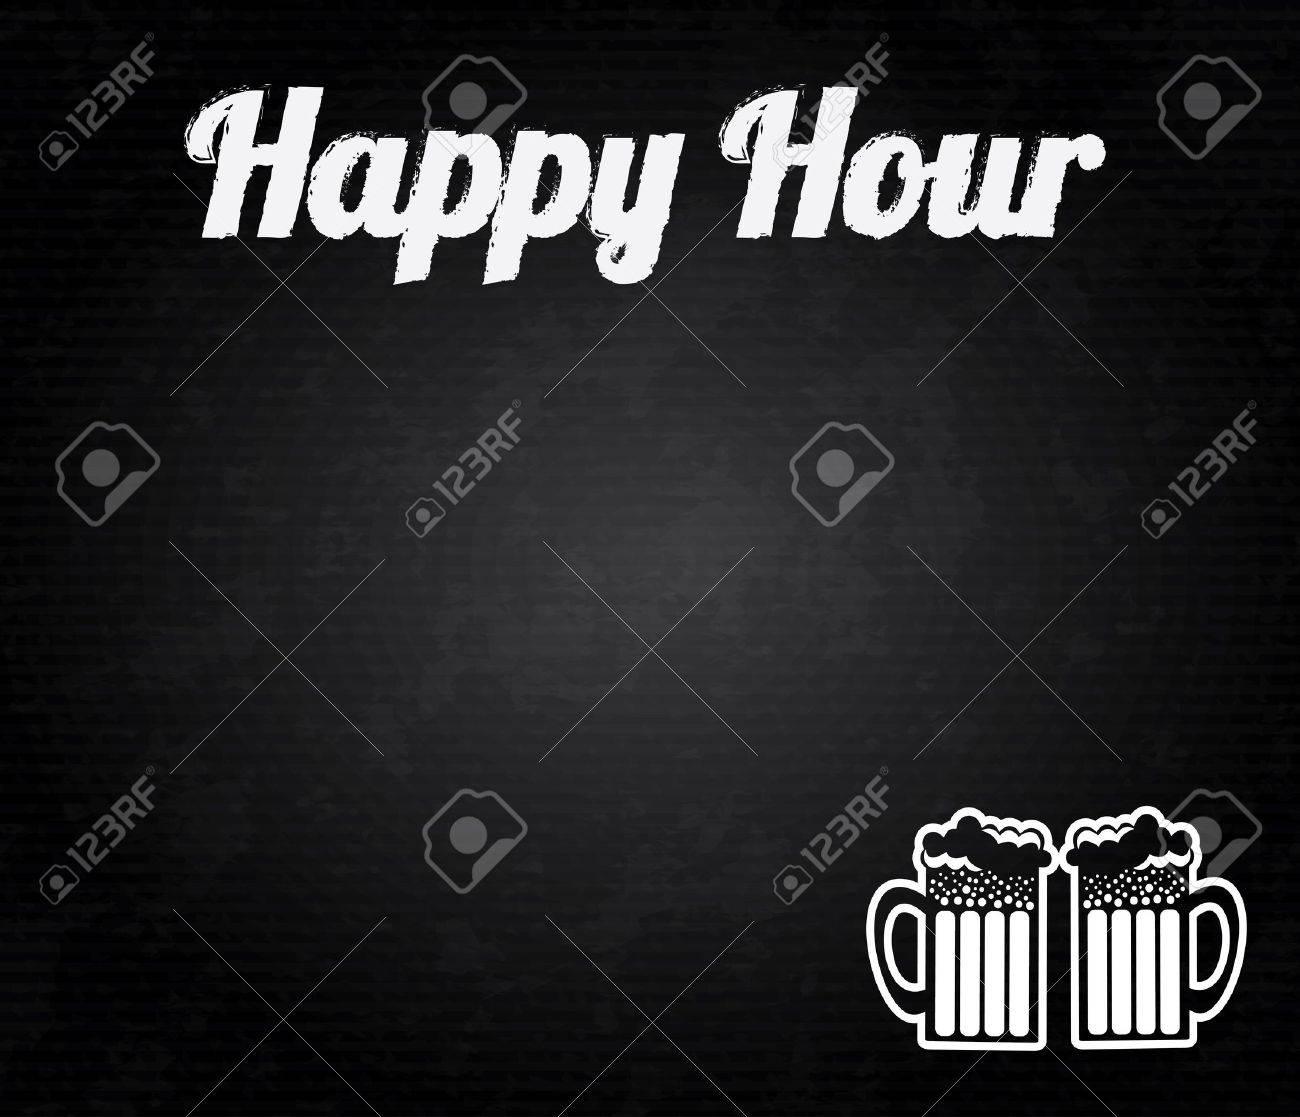 happy hour design over black background vector illustration Stock Vector - 20054025